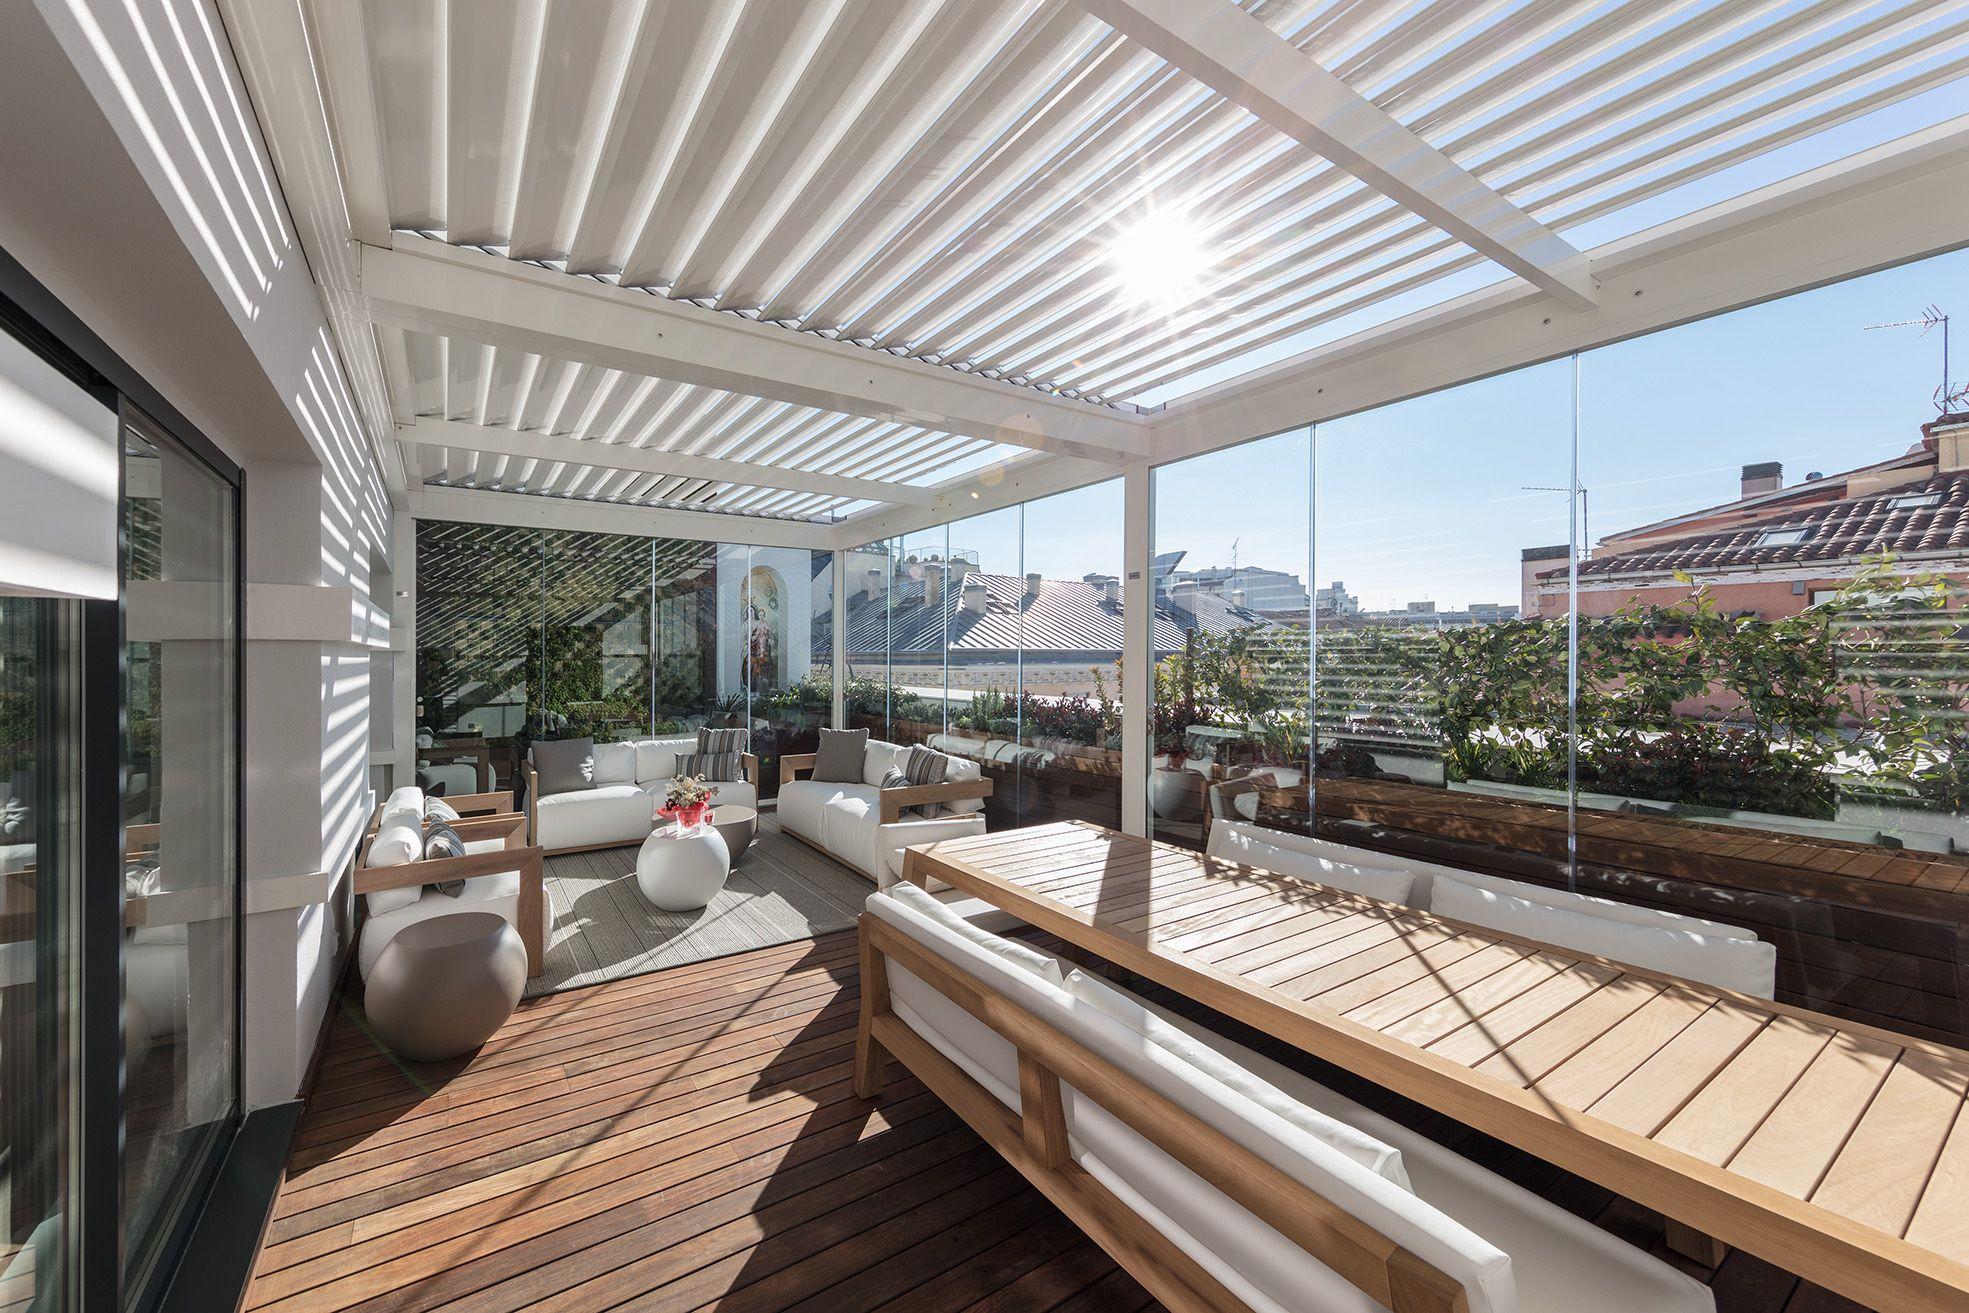 Terraza con p rgola en madrid la habitaci n verde - Pergola terraza atico ...